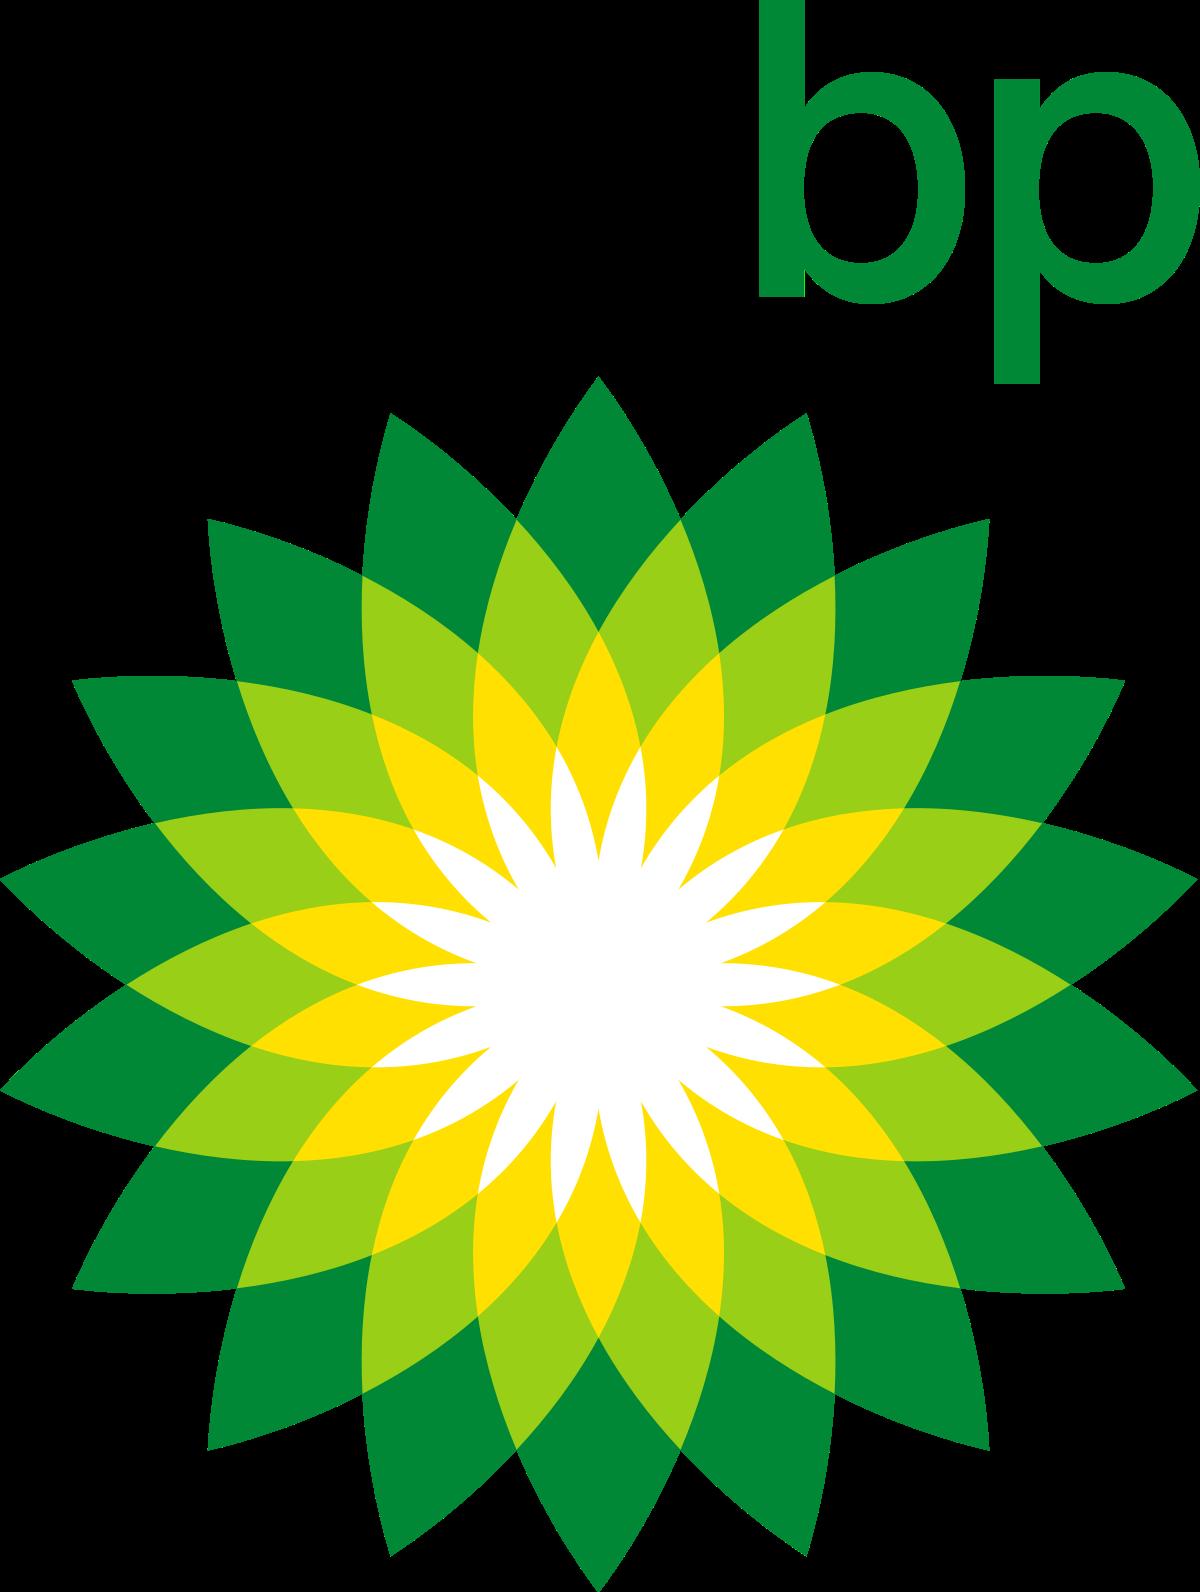 Bp company logo تعرف على 7 من أنواع الشعارات -اللوجوهات- المختلفة